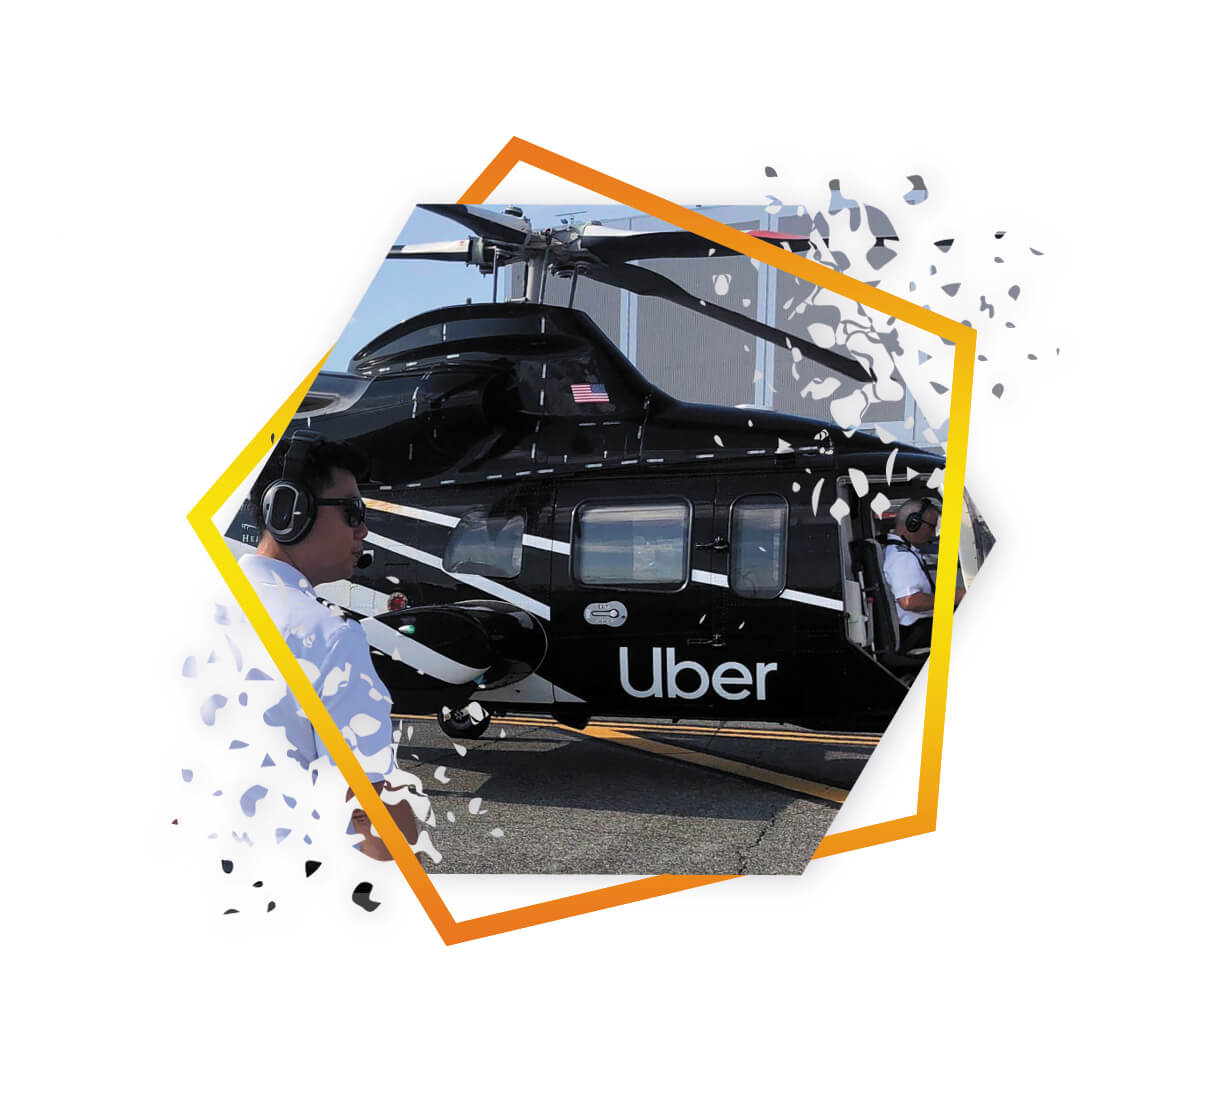 taxi-bay-uber